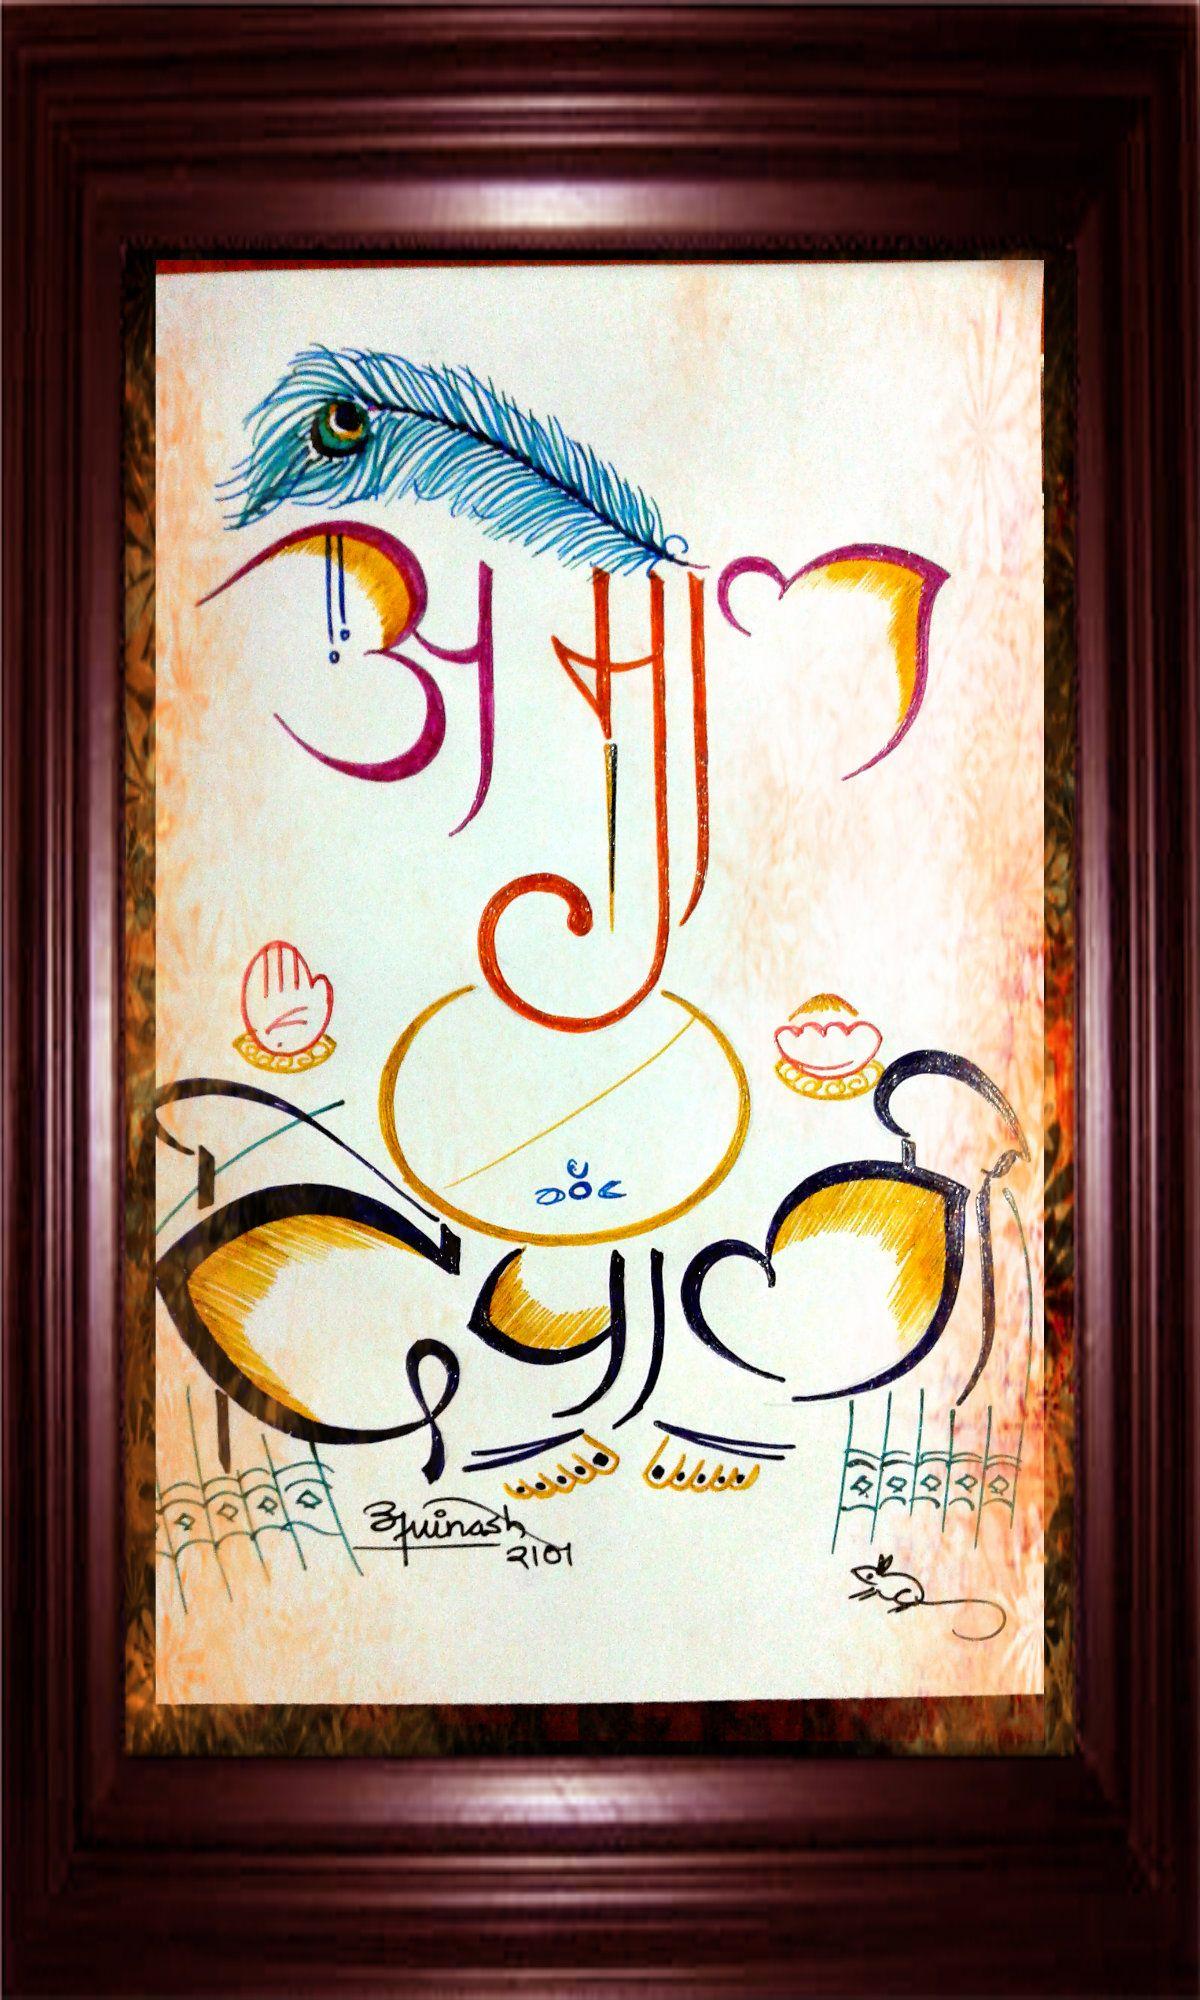 Amol Dipti Ganesh Ganpati Bappa Your Name Finding Yourself Ganesha